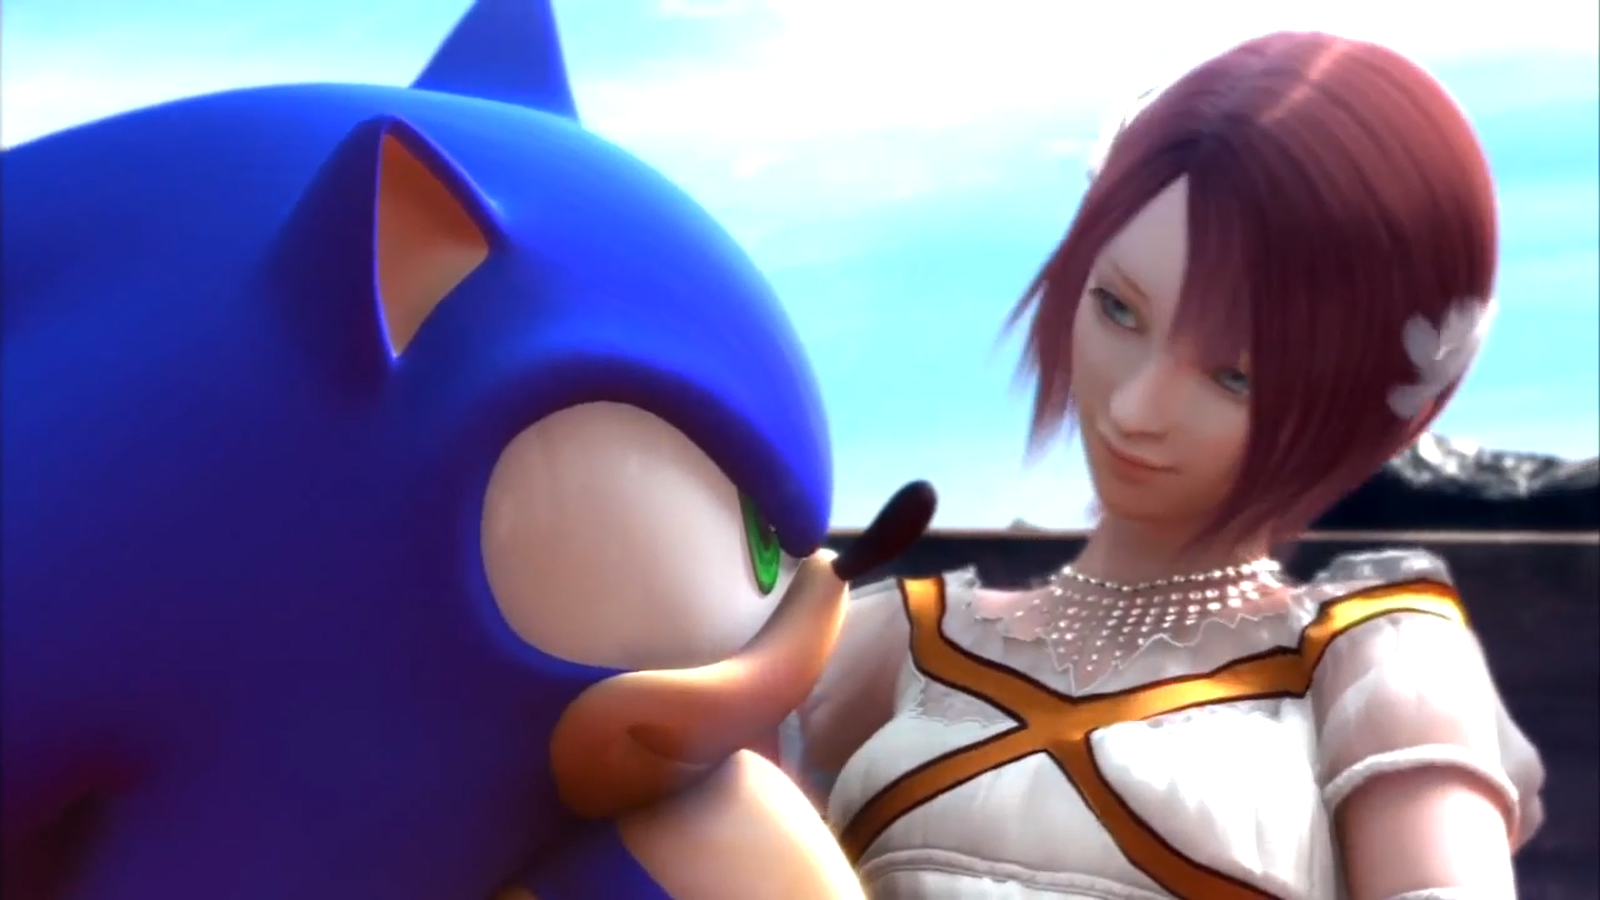 Sonic The Hedgehog 2006 PC MeriStationcom